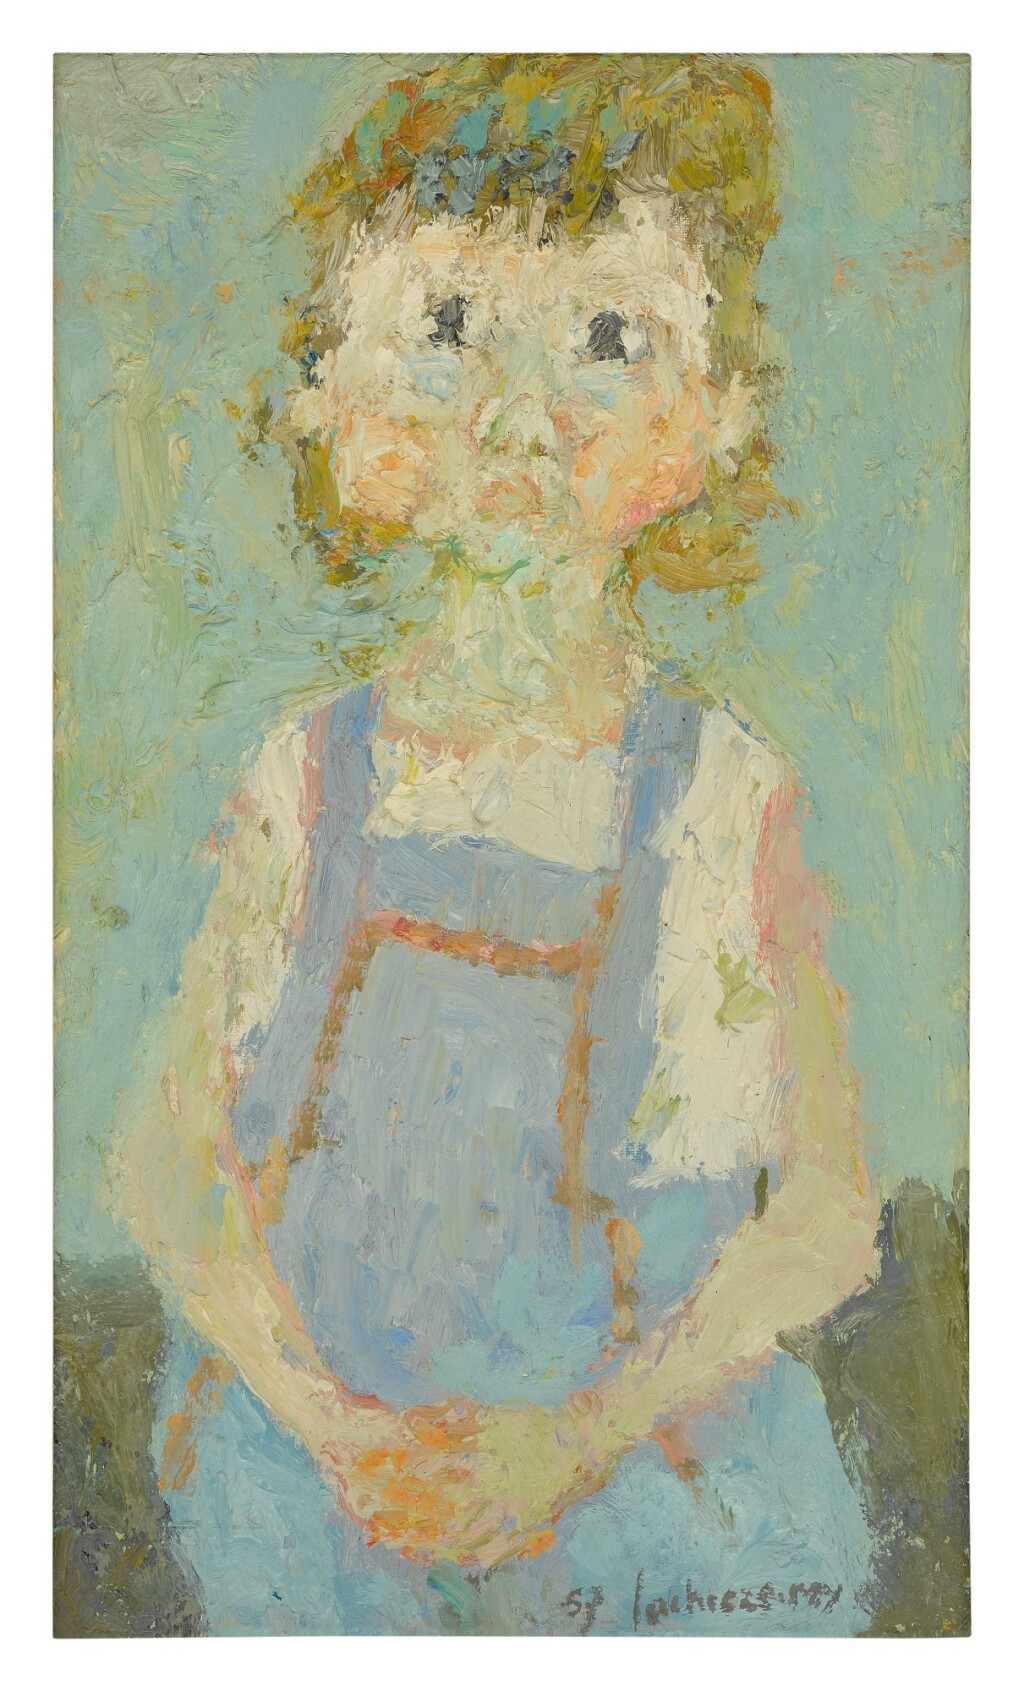 HENRI LACHIÈZE-REY | LITTLE GIRL